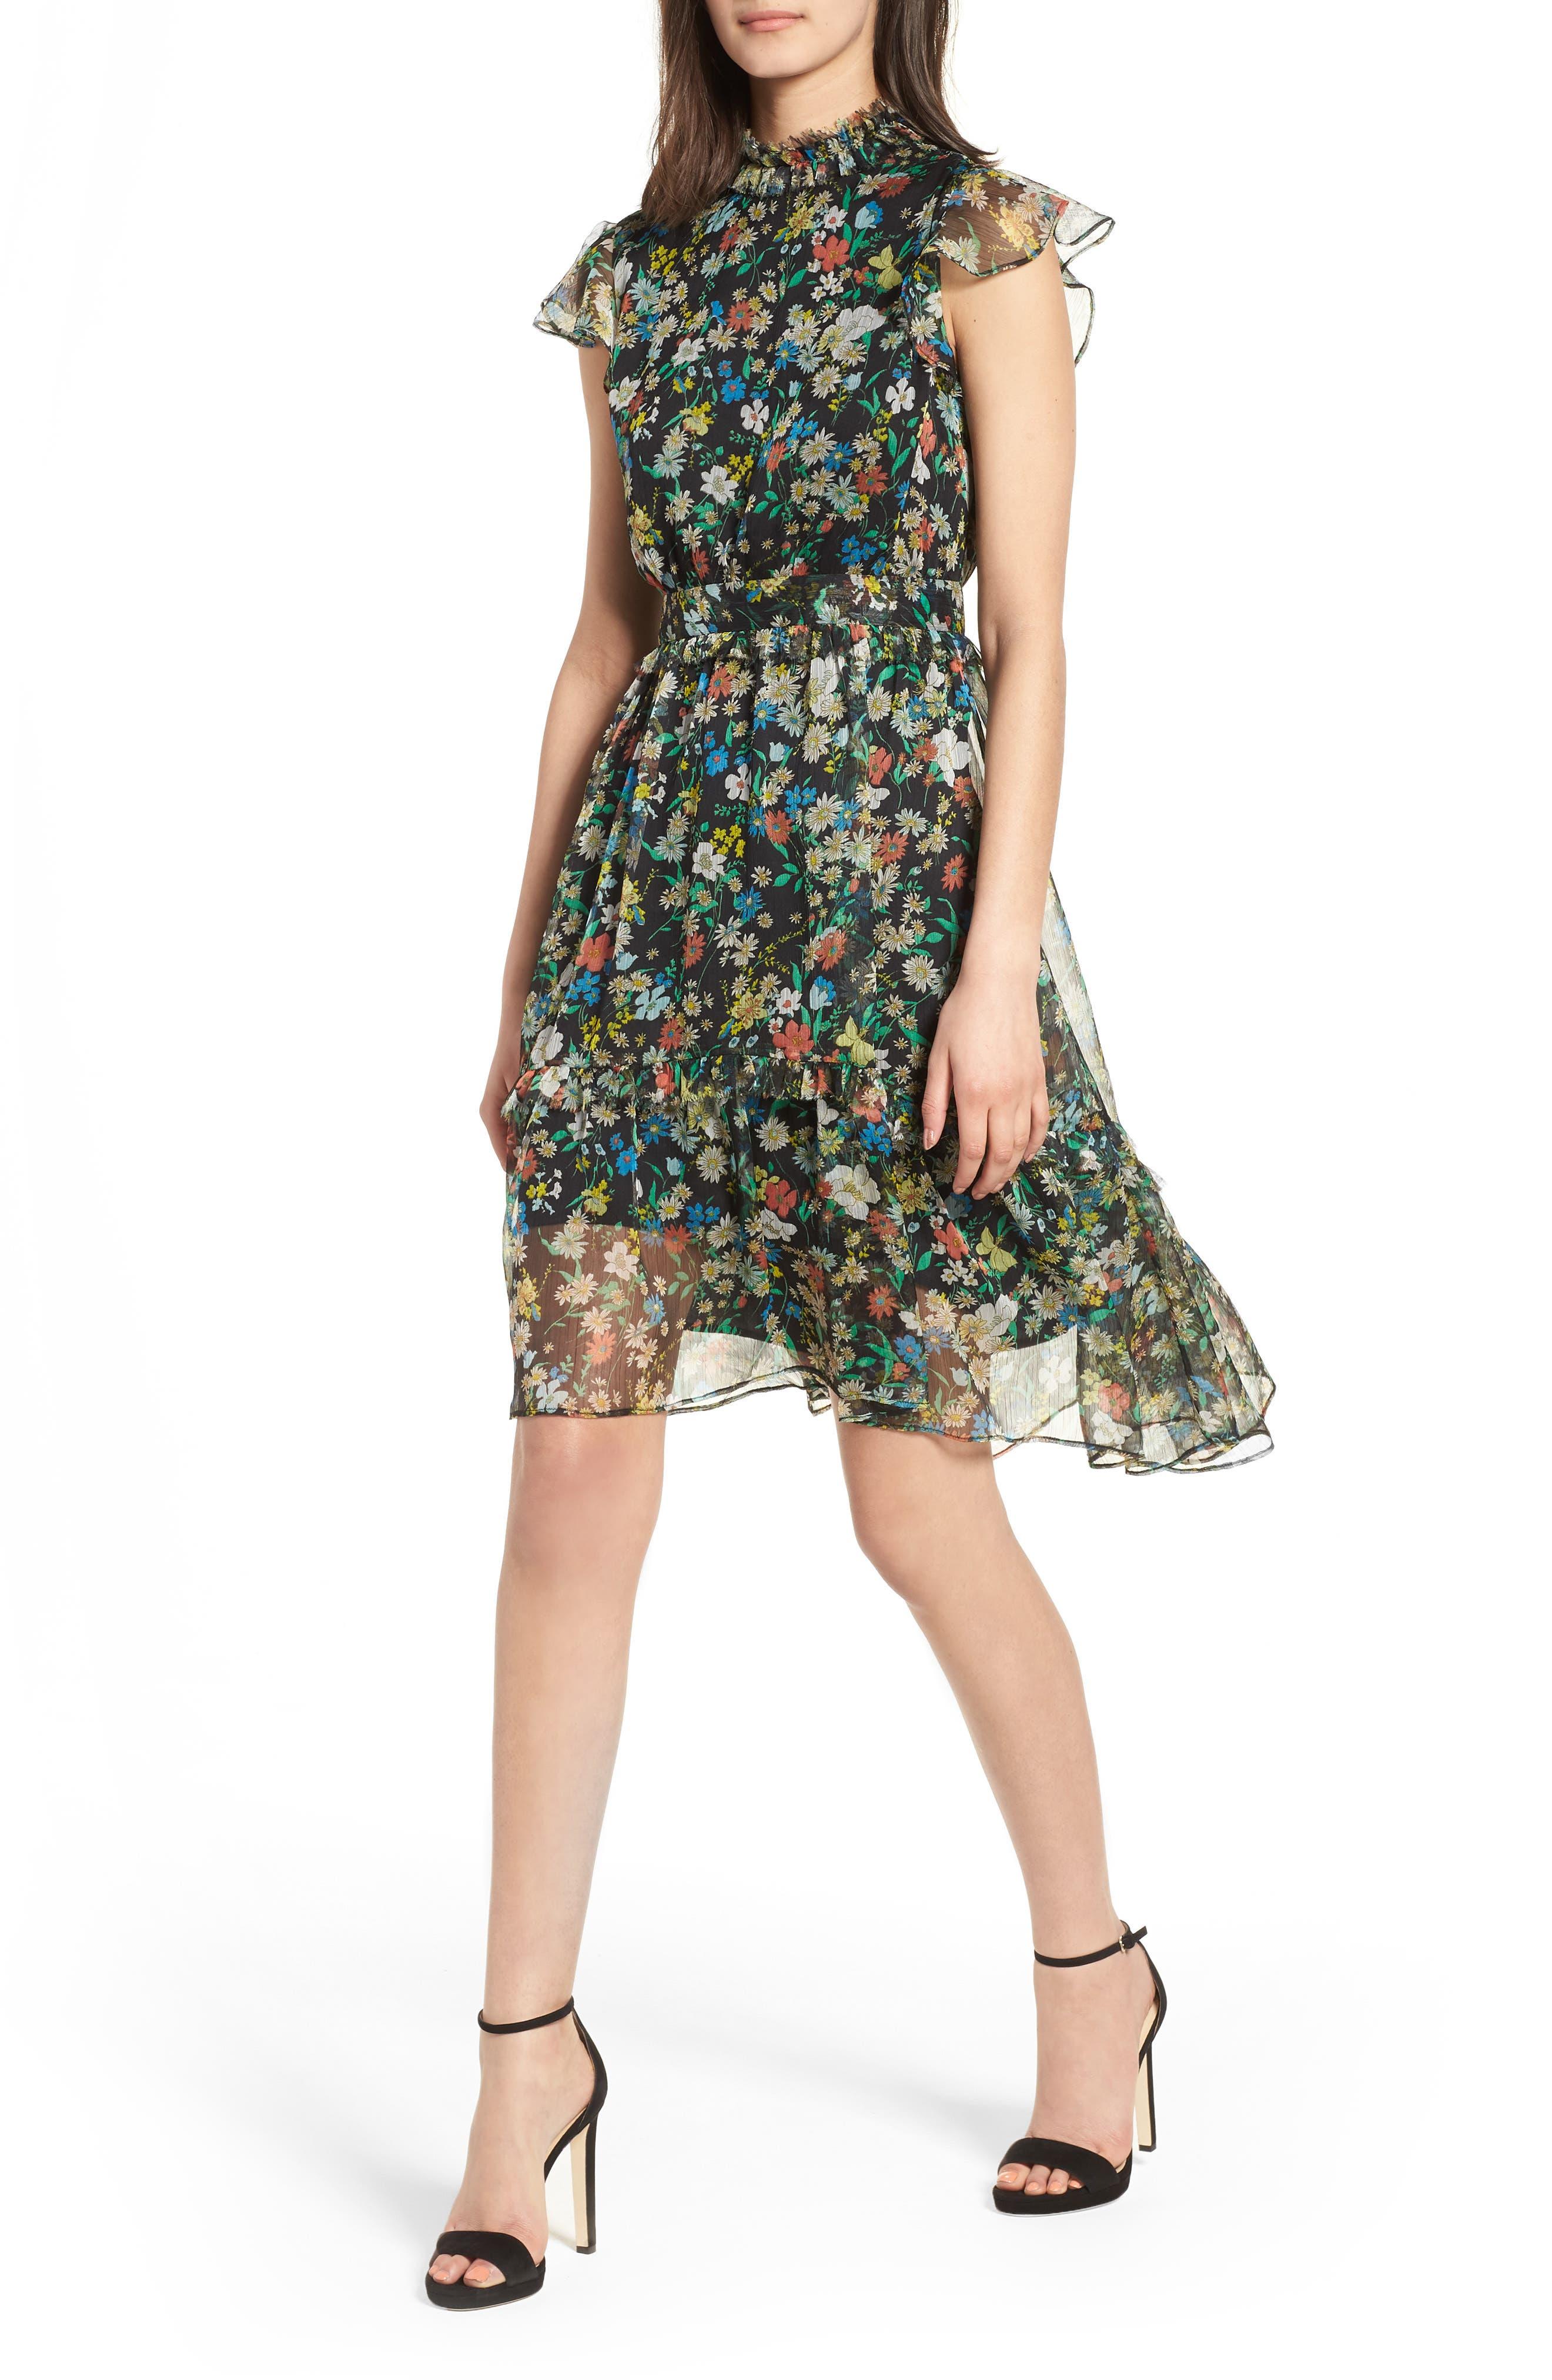 KENDALL + KYLIE Floral Print Dress